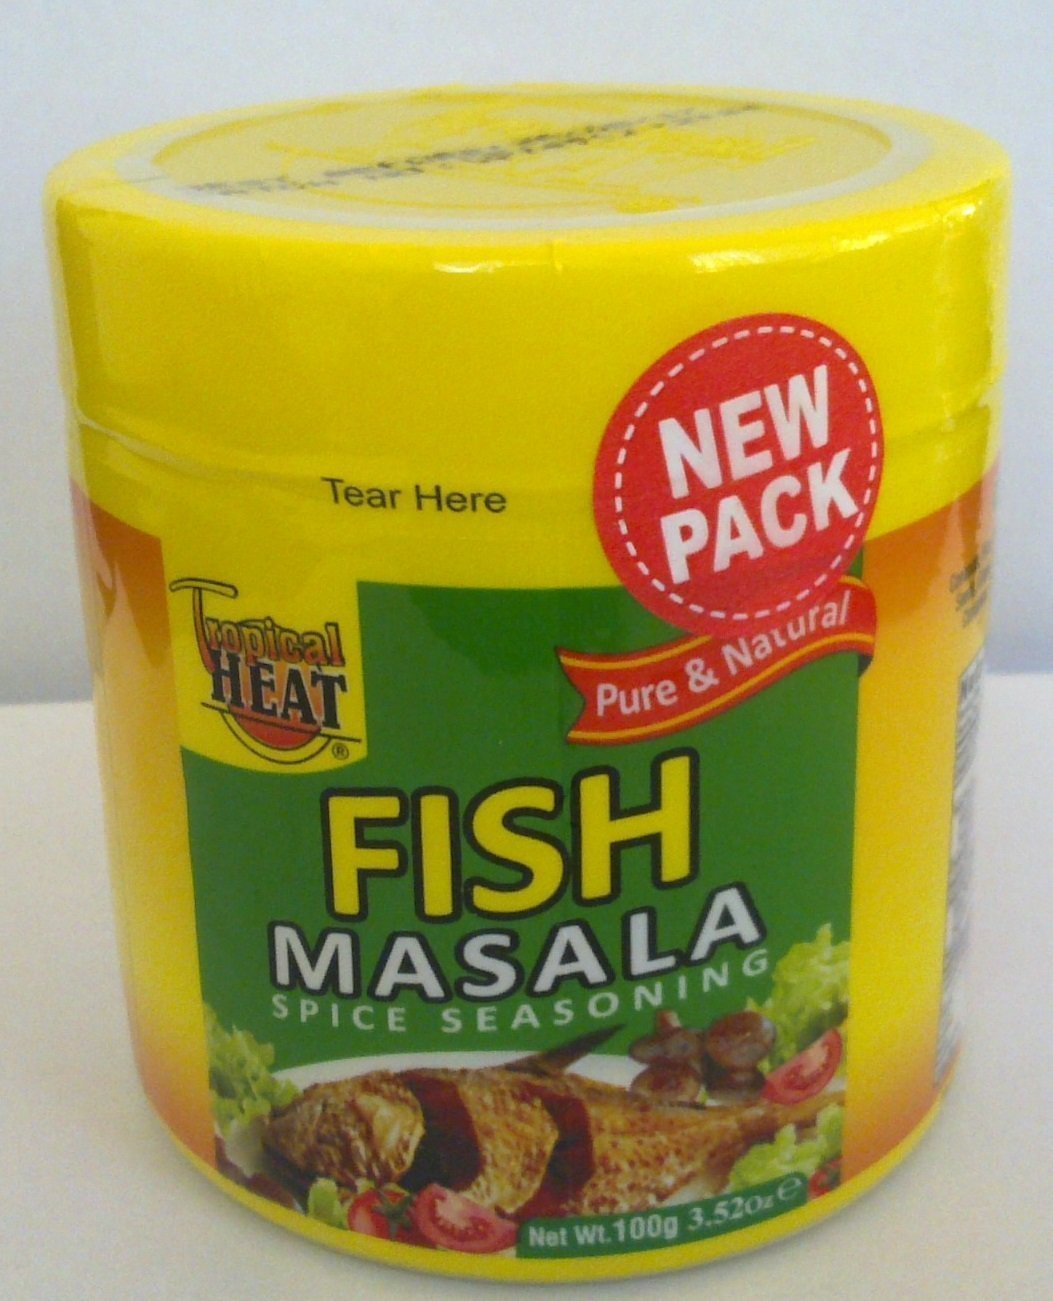 Tropical heat fish Masala spices seasonings from Kenya-100Gms